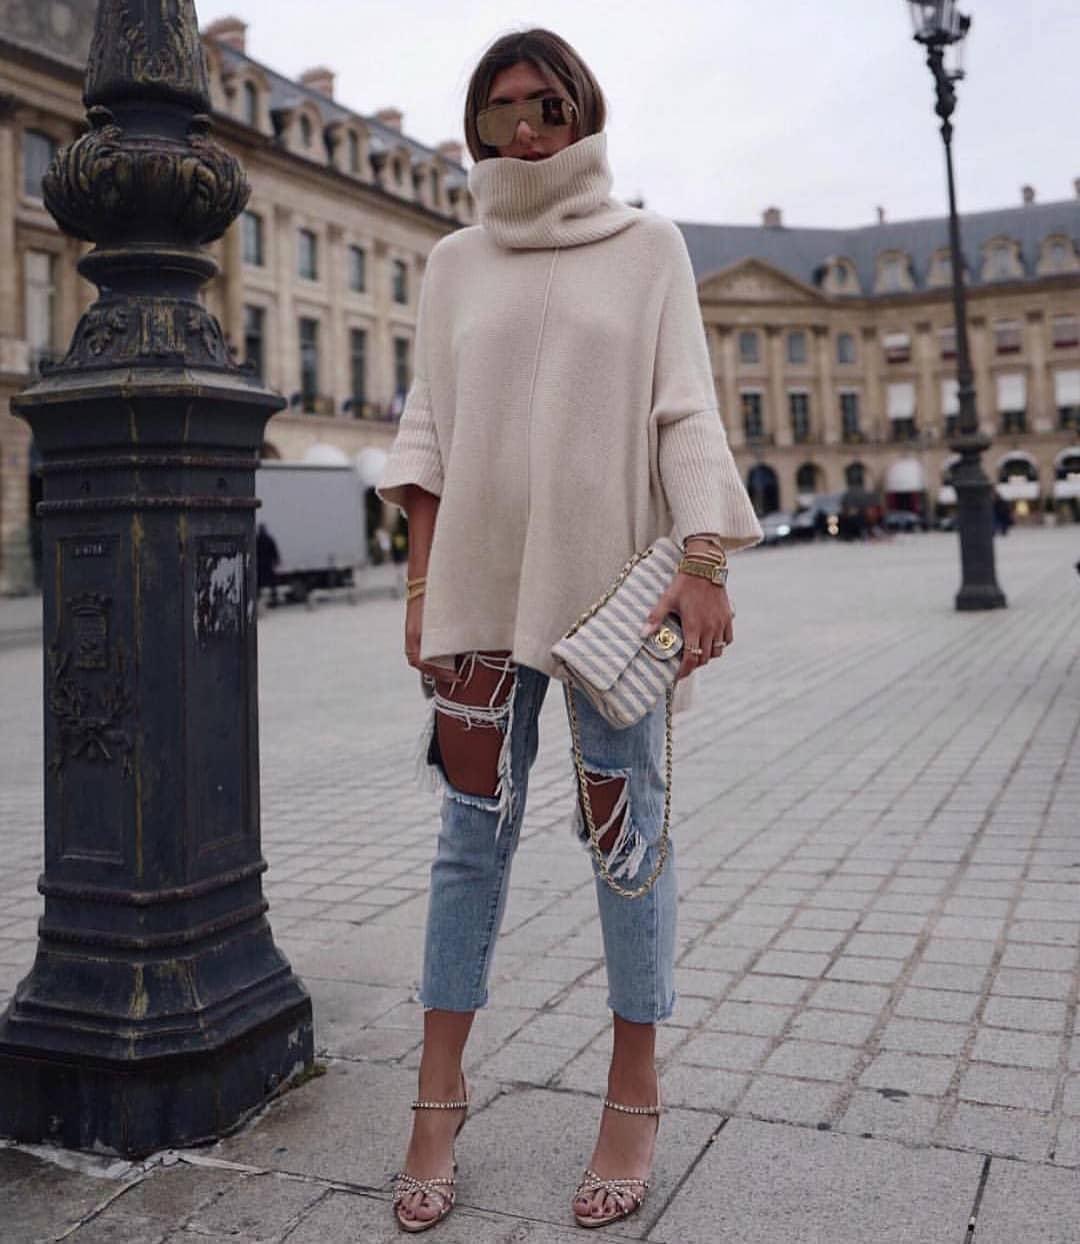 fashion____daily____2_4_2019_1_19_50_351.jpg